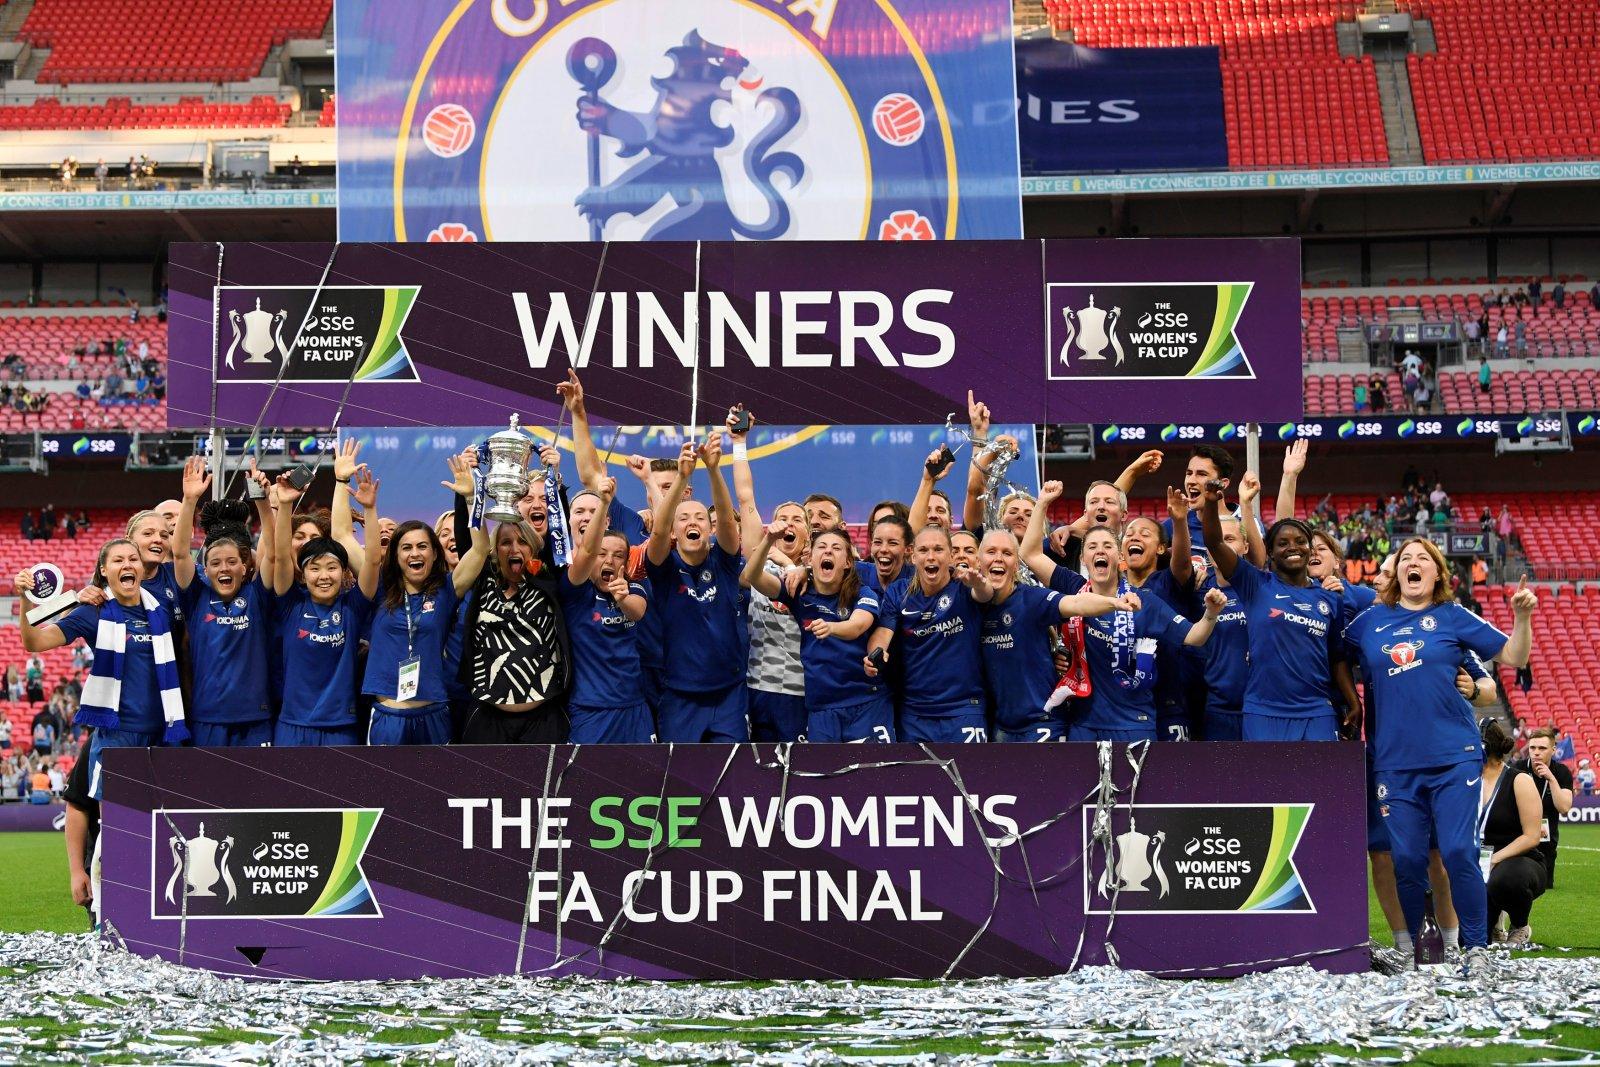 womens football FA cup final